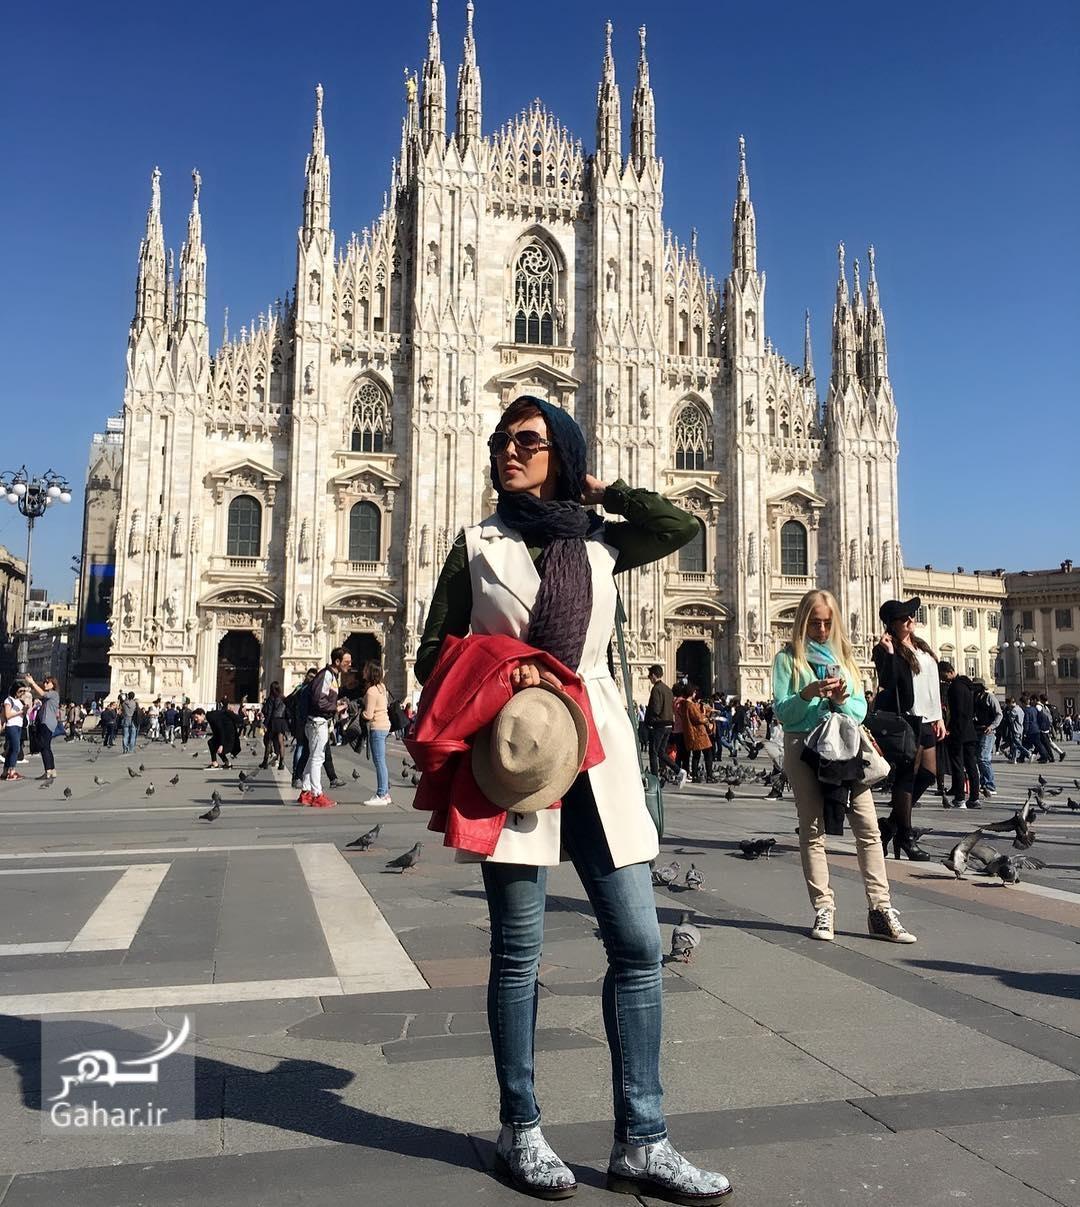 تفریح متفاوت لیلا بلوکات در ایتالیا + عکس, جدید 1400 -گهر